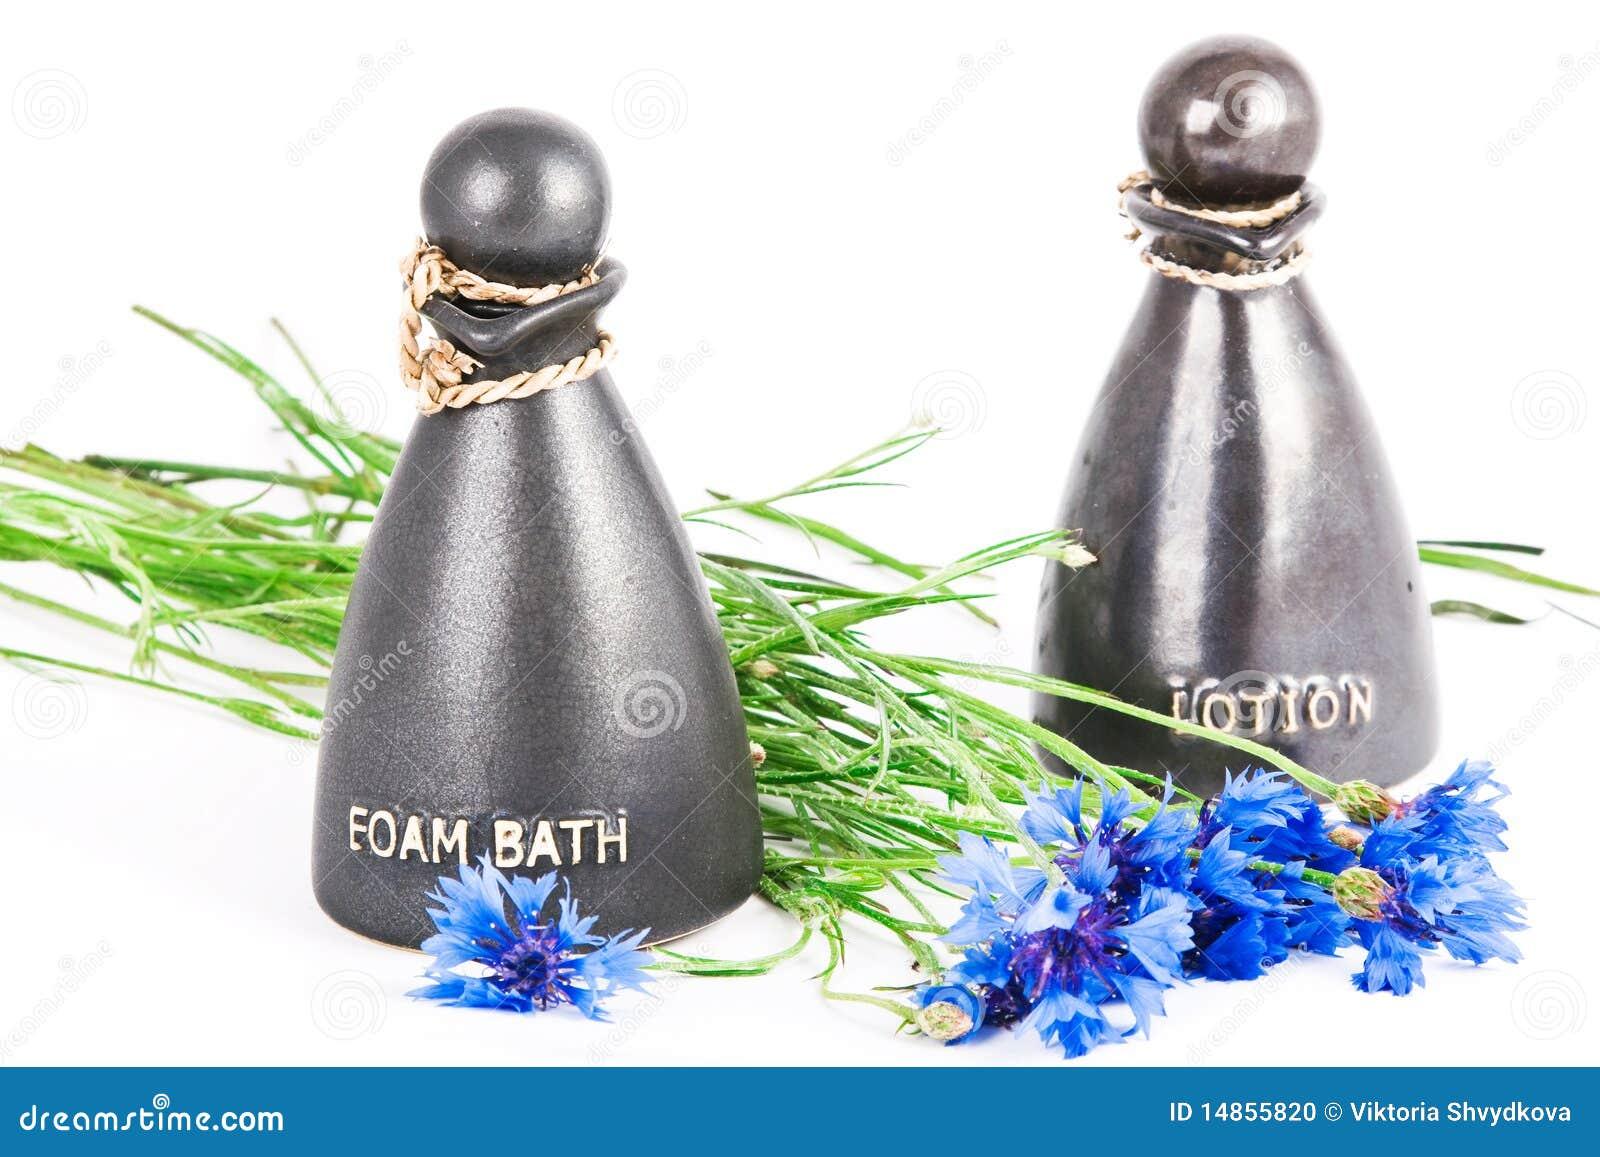 Foam bath and lotion